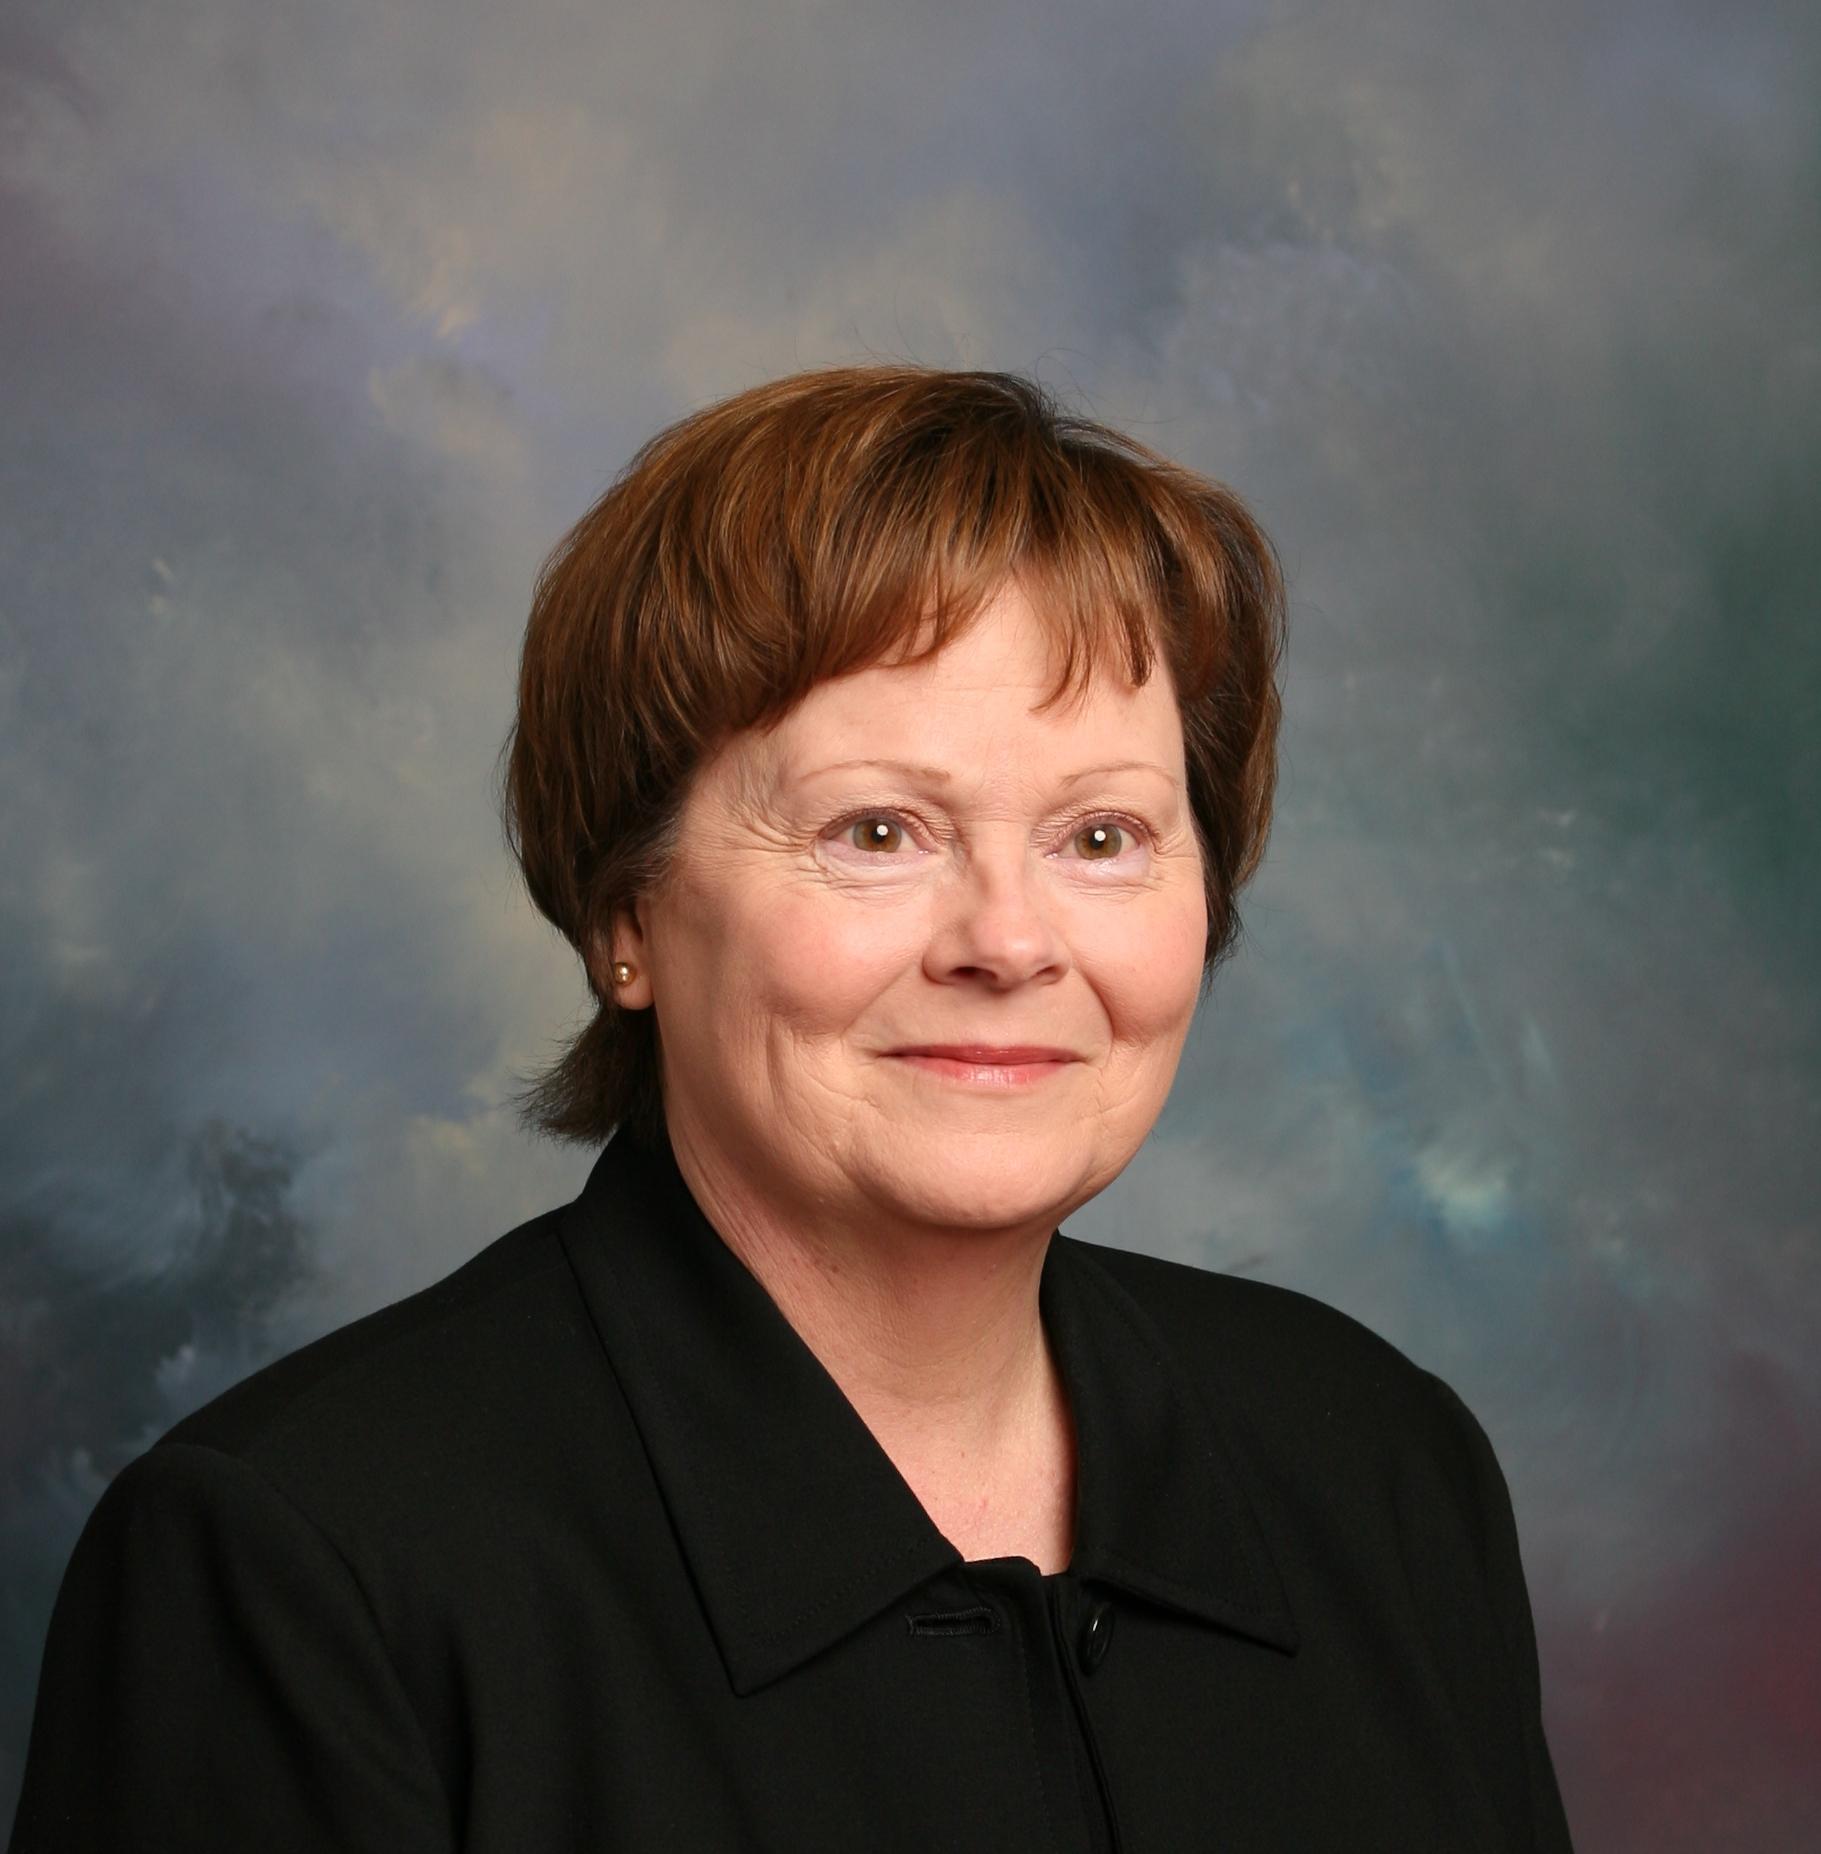 Bonnie Smetzer Headshot